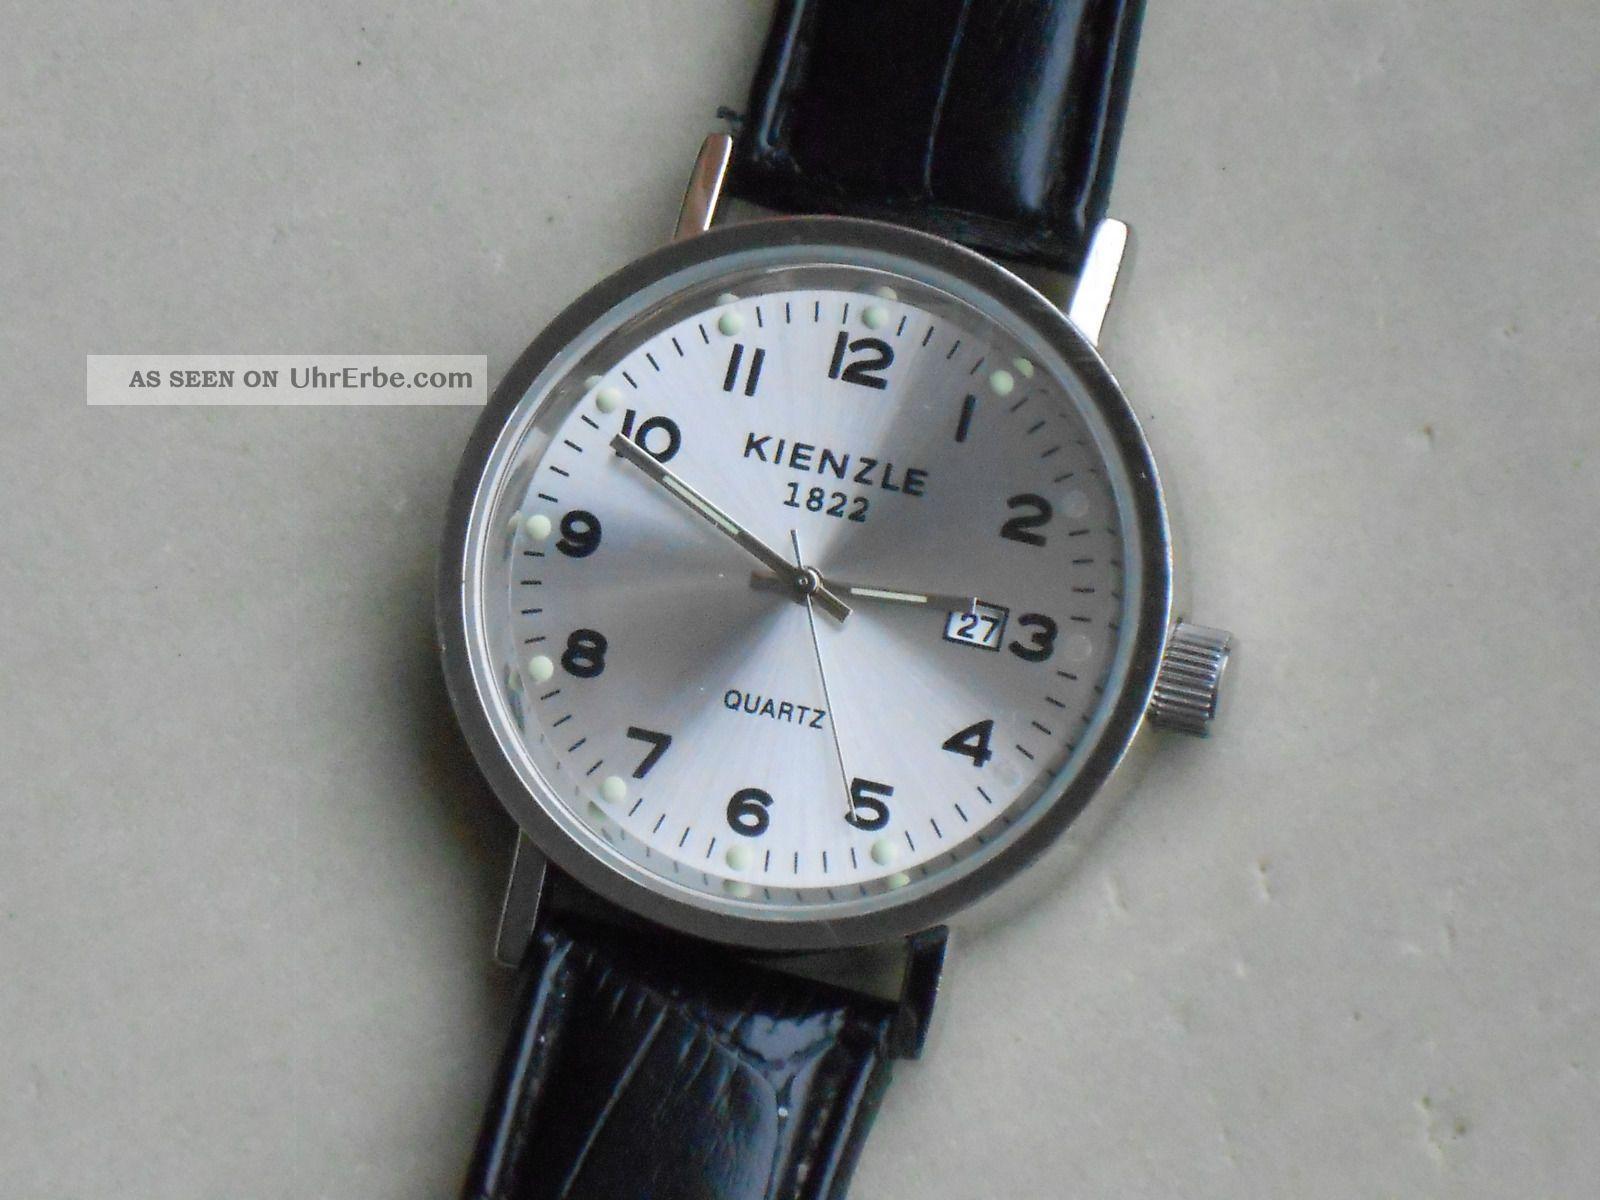 Kienzle Armbanduhr Für Herren 1822 Armbanduhren Bild